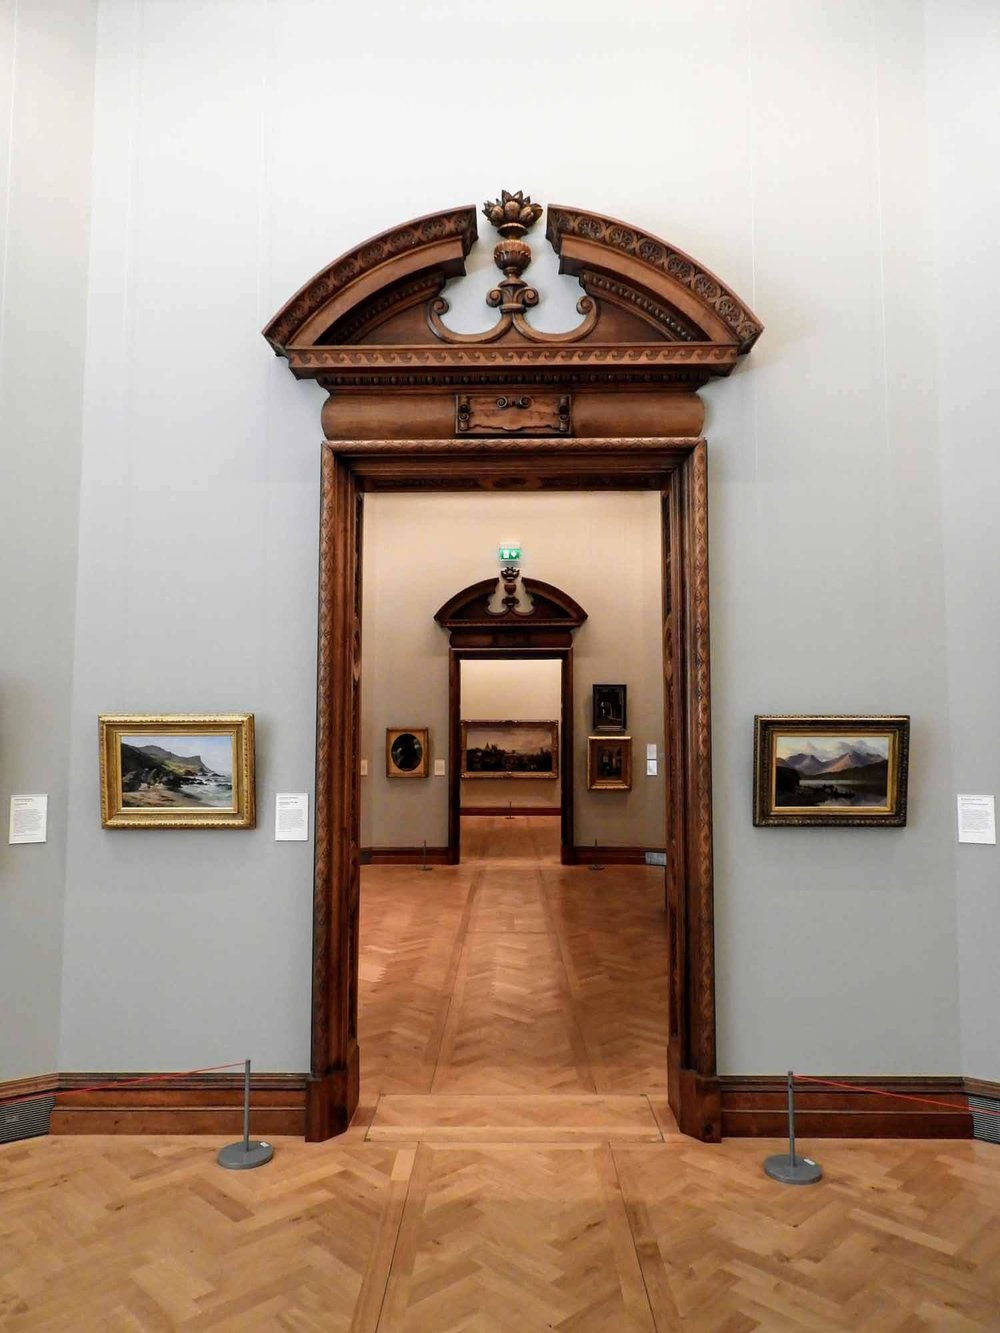 ireland-dublin-national-gallery-doorway-wood-molding-art.jpg